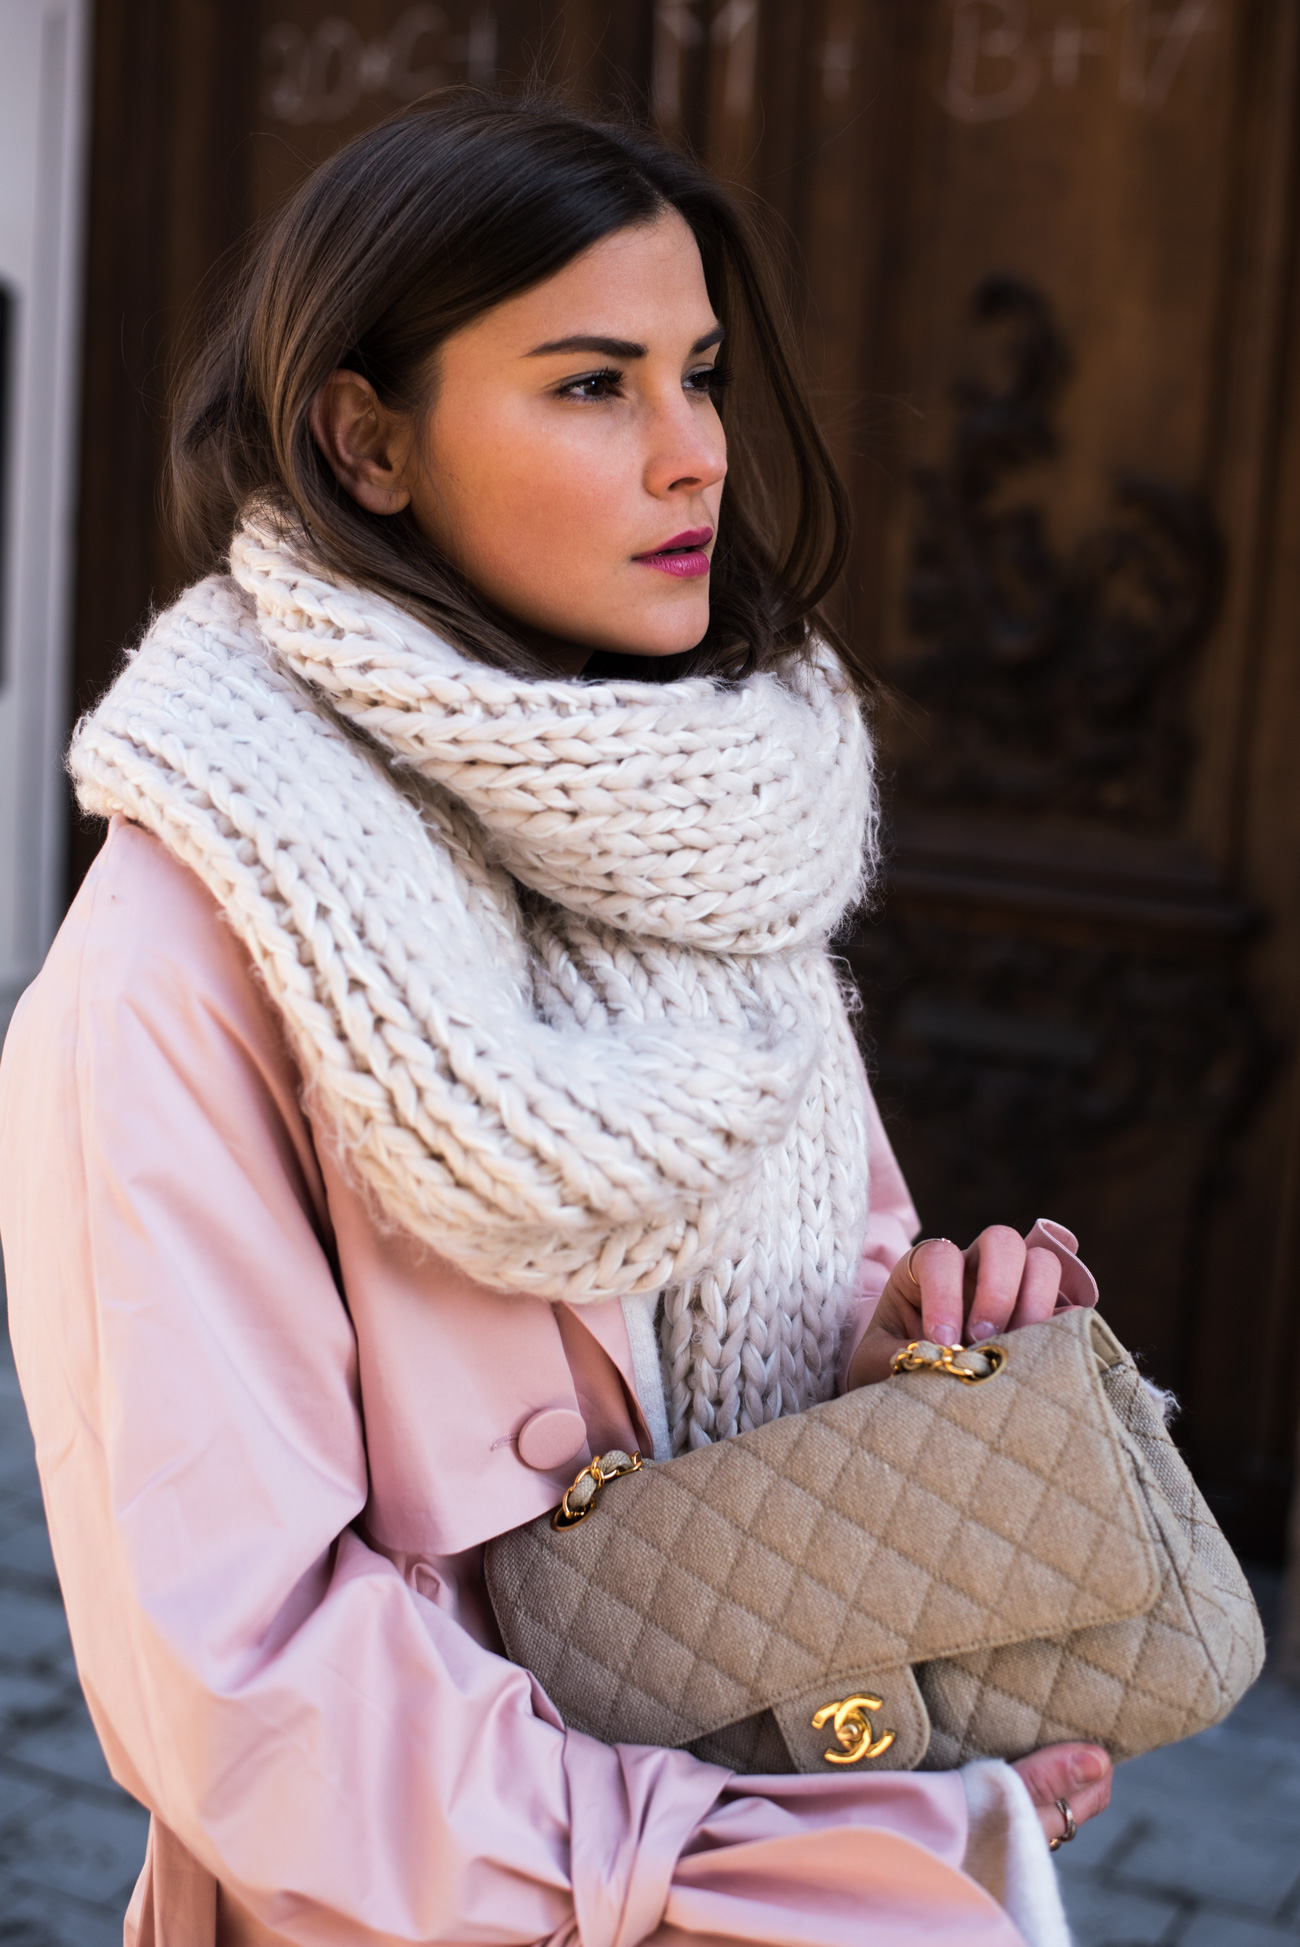 grobstrick-schal-beige-hellrosa-knit-scarf-rose-fashiioncarpet